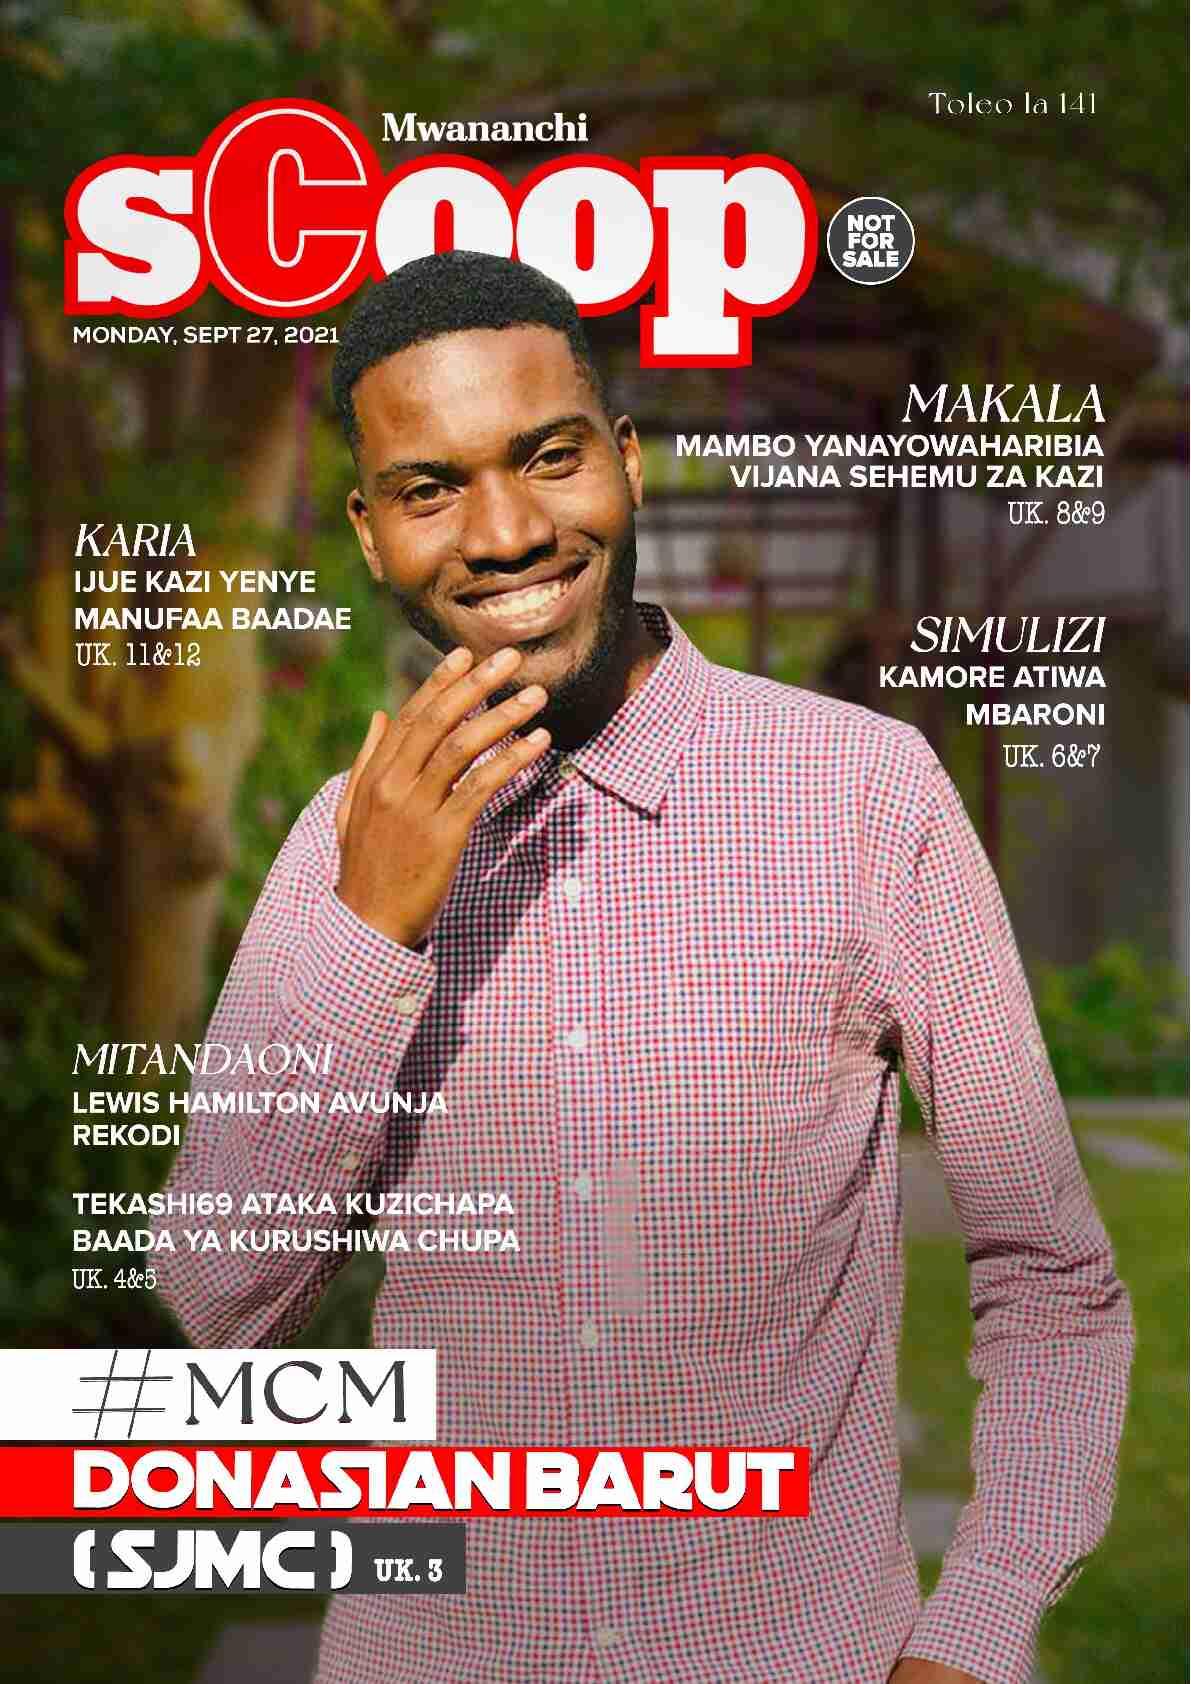 #MCM: Donasian Baruti(SJMC)